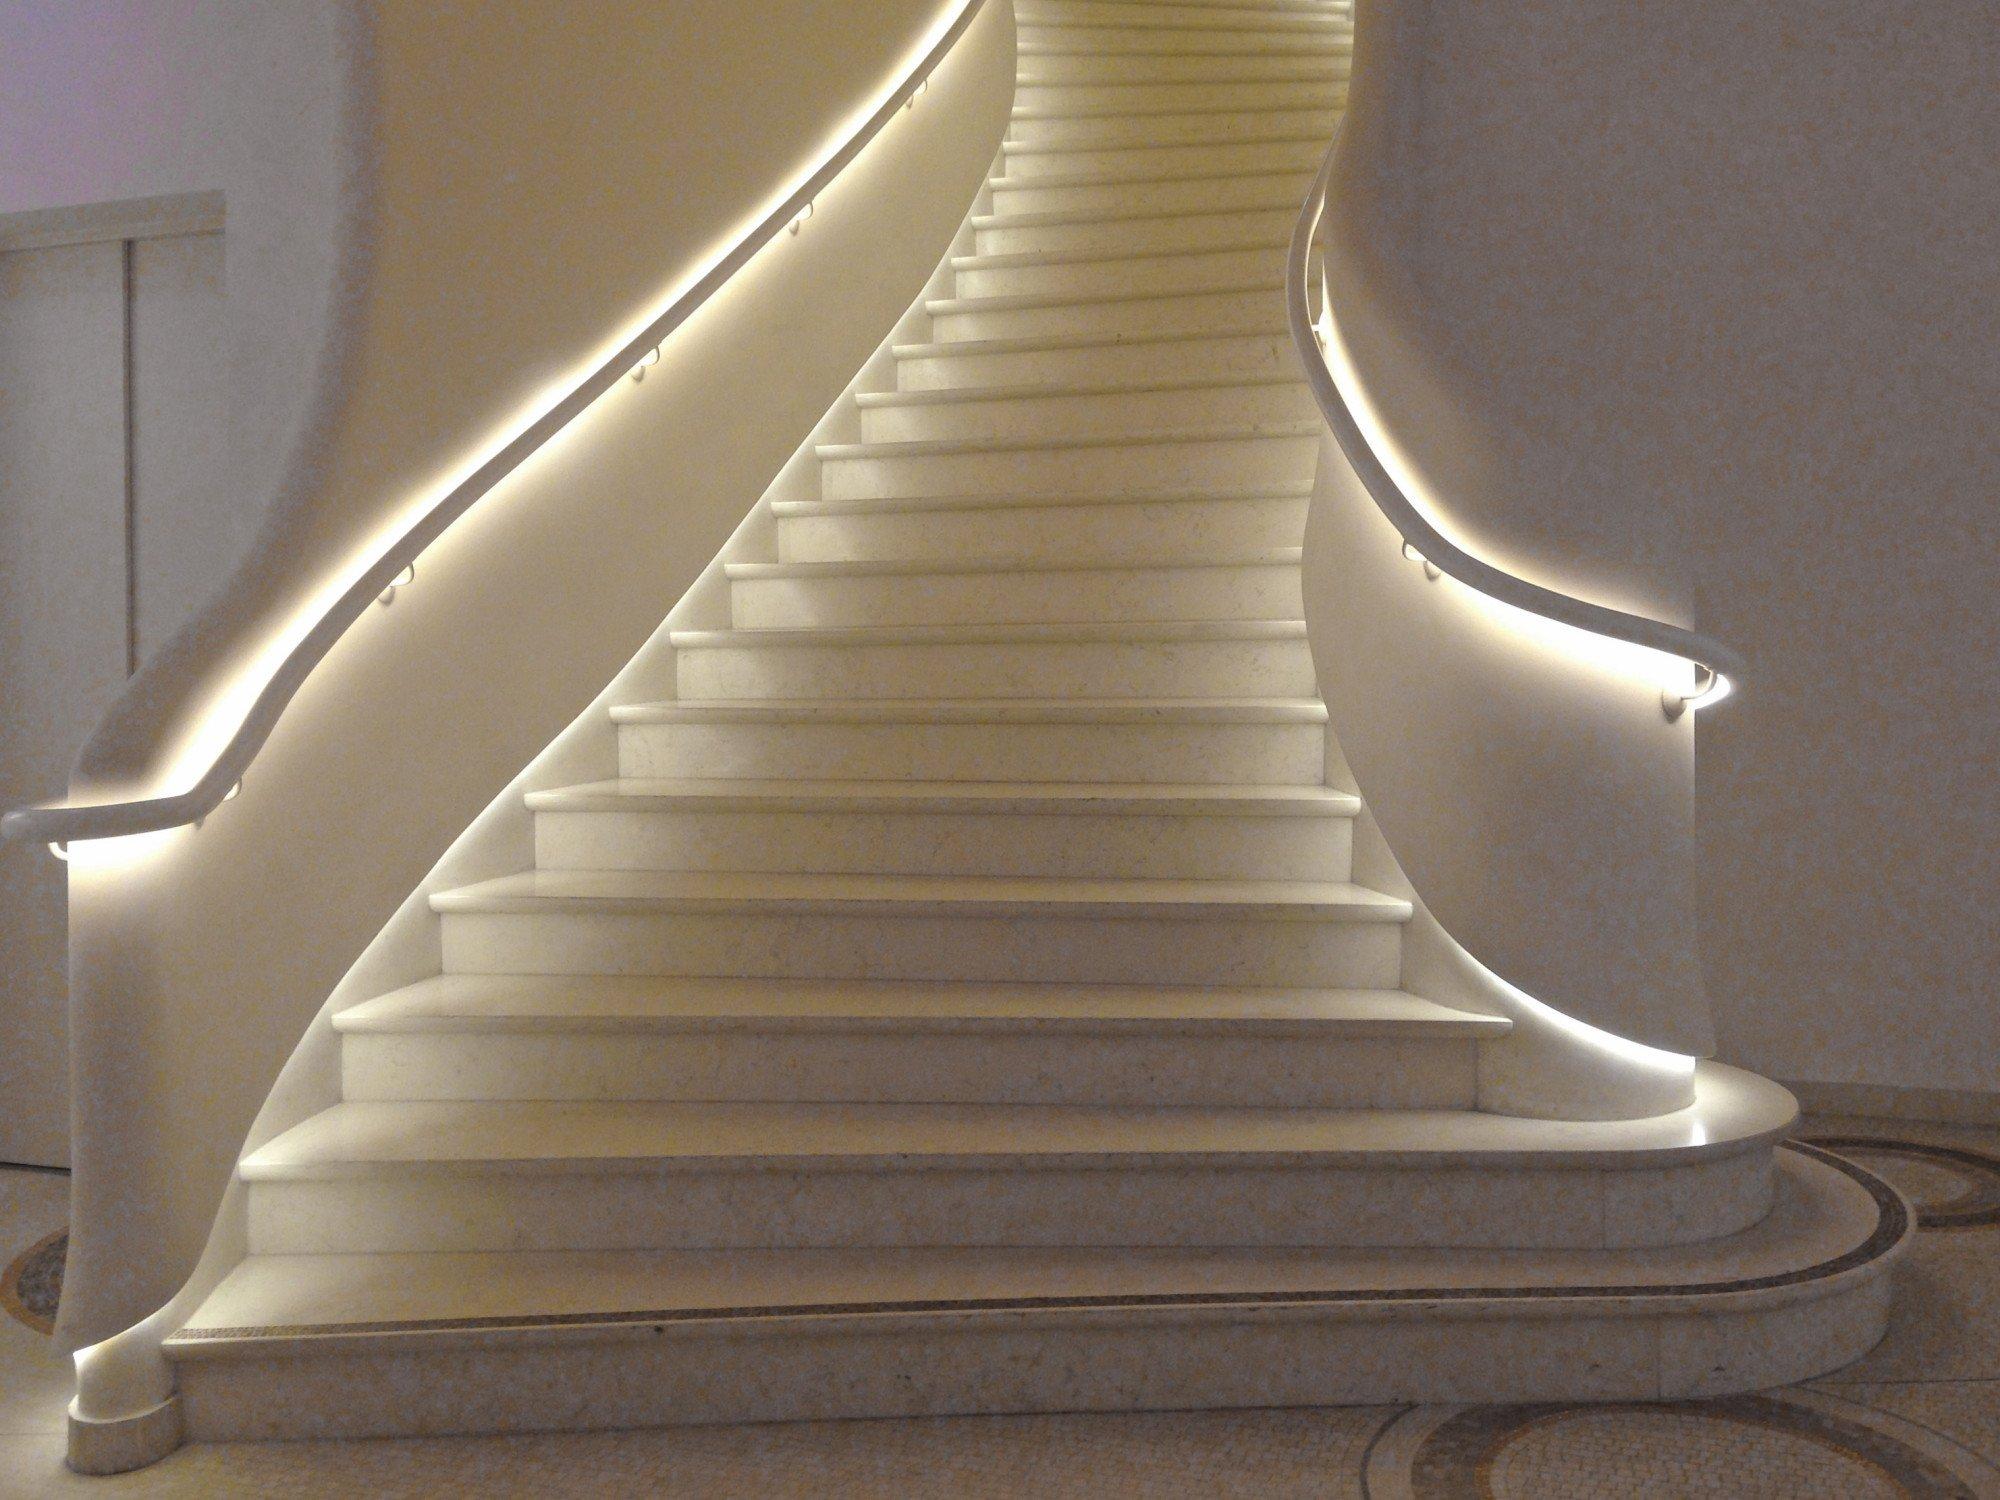 arbeitsplatzbeleuchtung licht beleuchtungsarten baunetz wissen. Black Bedroom Furniture Sets. Home Design Ideas